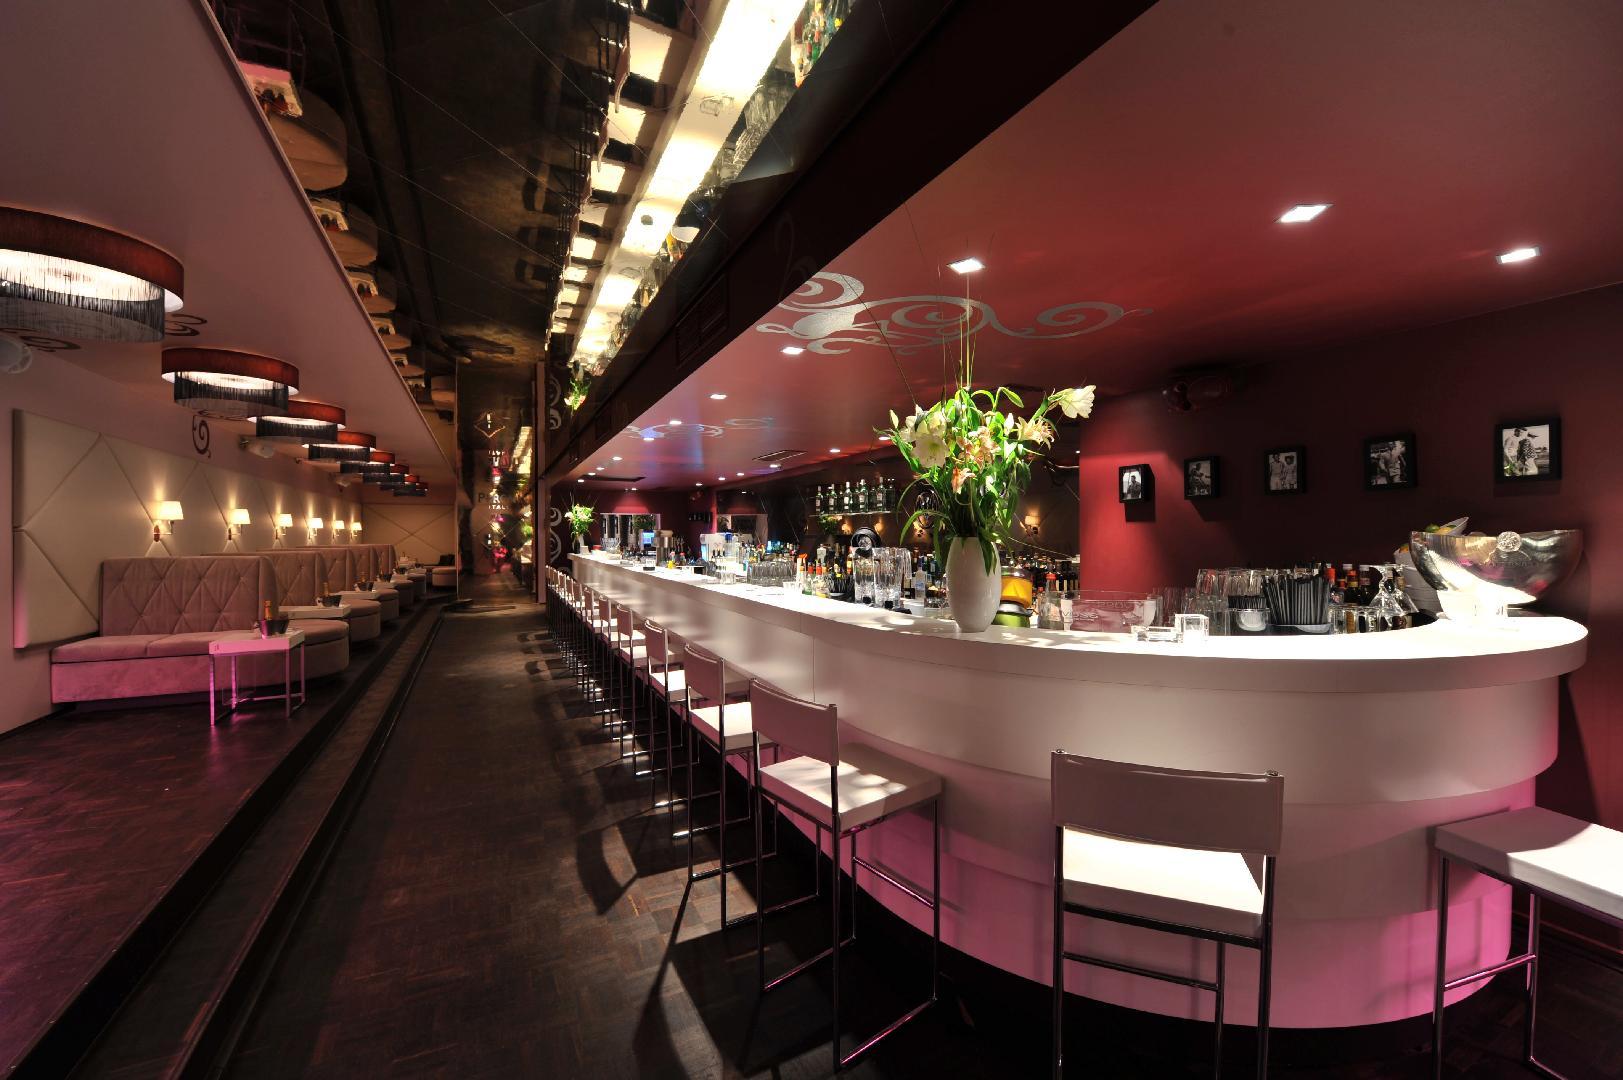 Picture 2 of Flamingo Royal Boutique Club